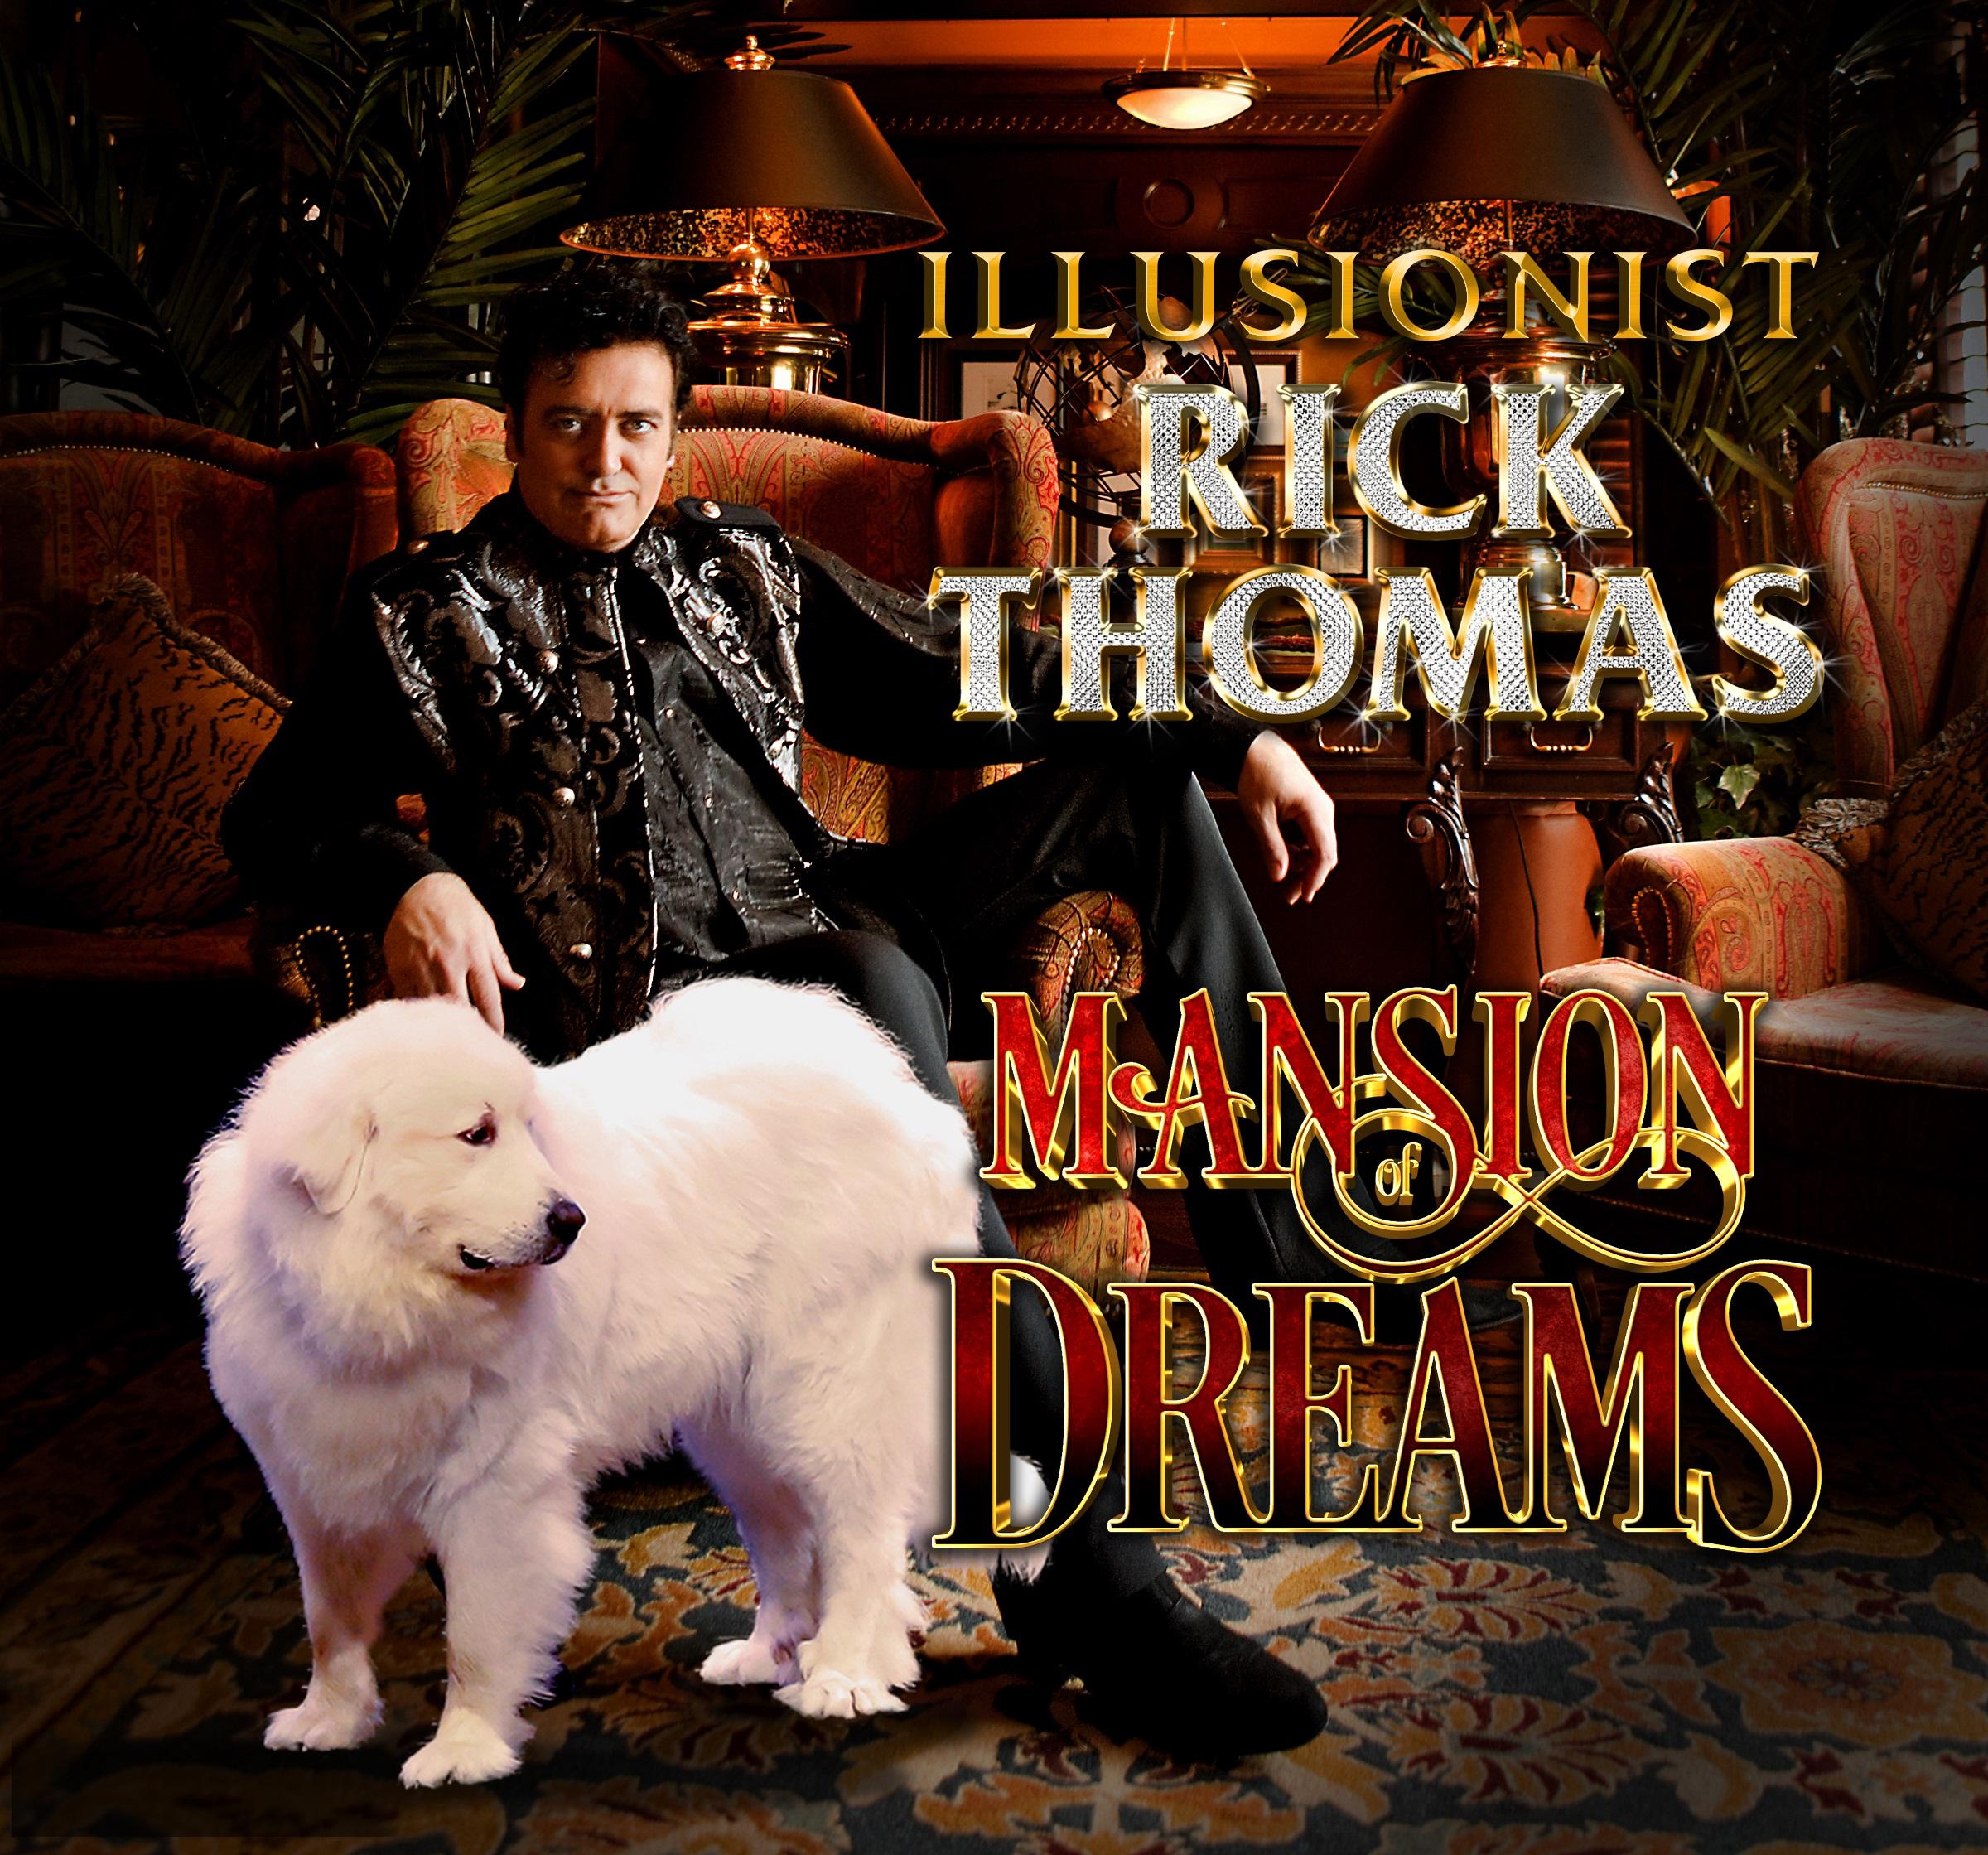 Illusionist_Rick_Thomas_Mansion_of_Dreams